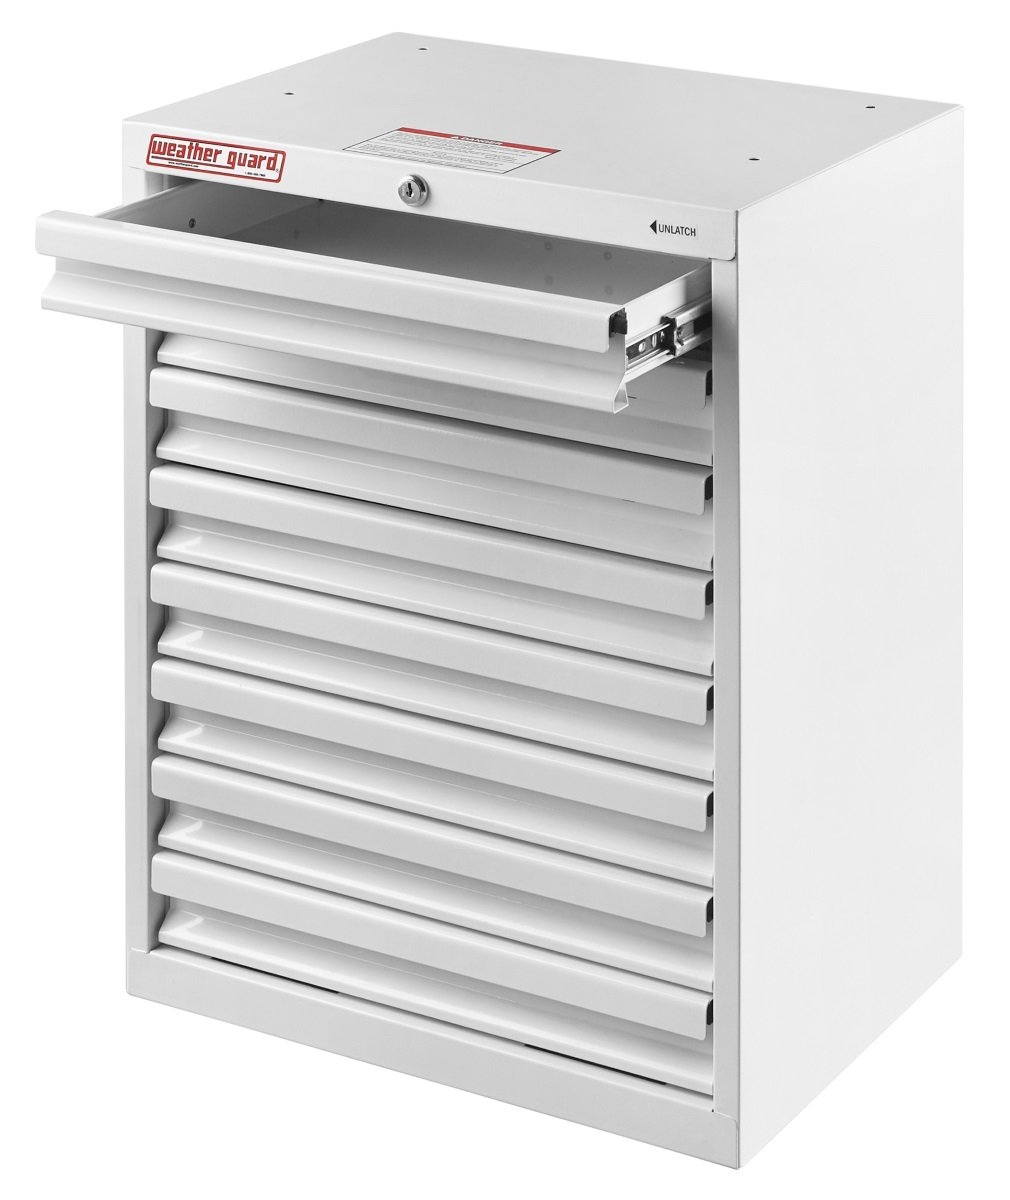 Amazon.com: WEATHER GUARD 9988301 Drawer Cabinet: Automotive